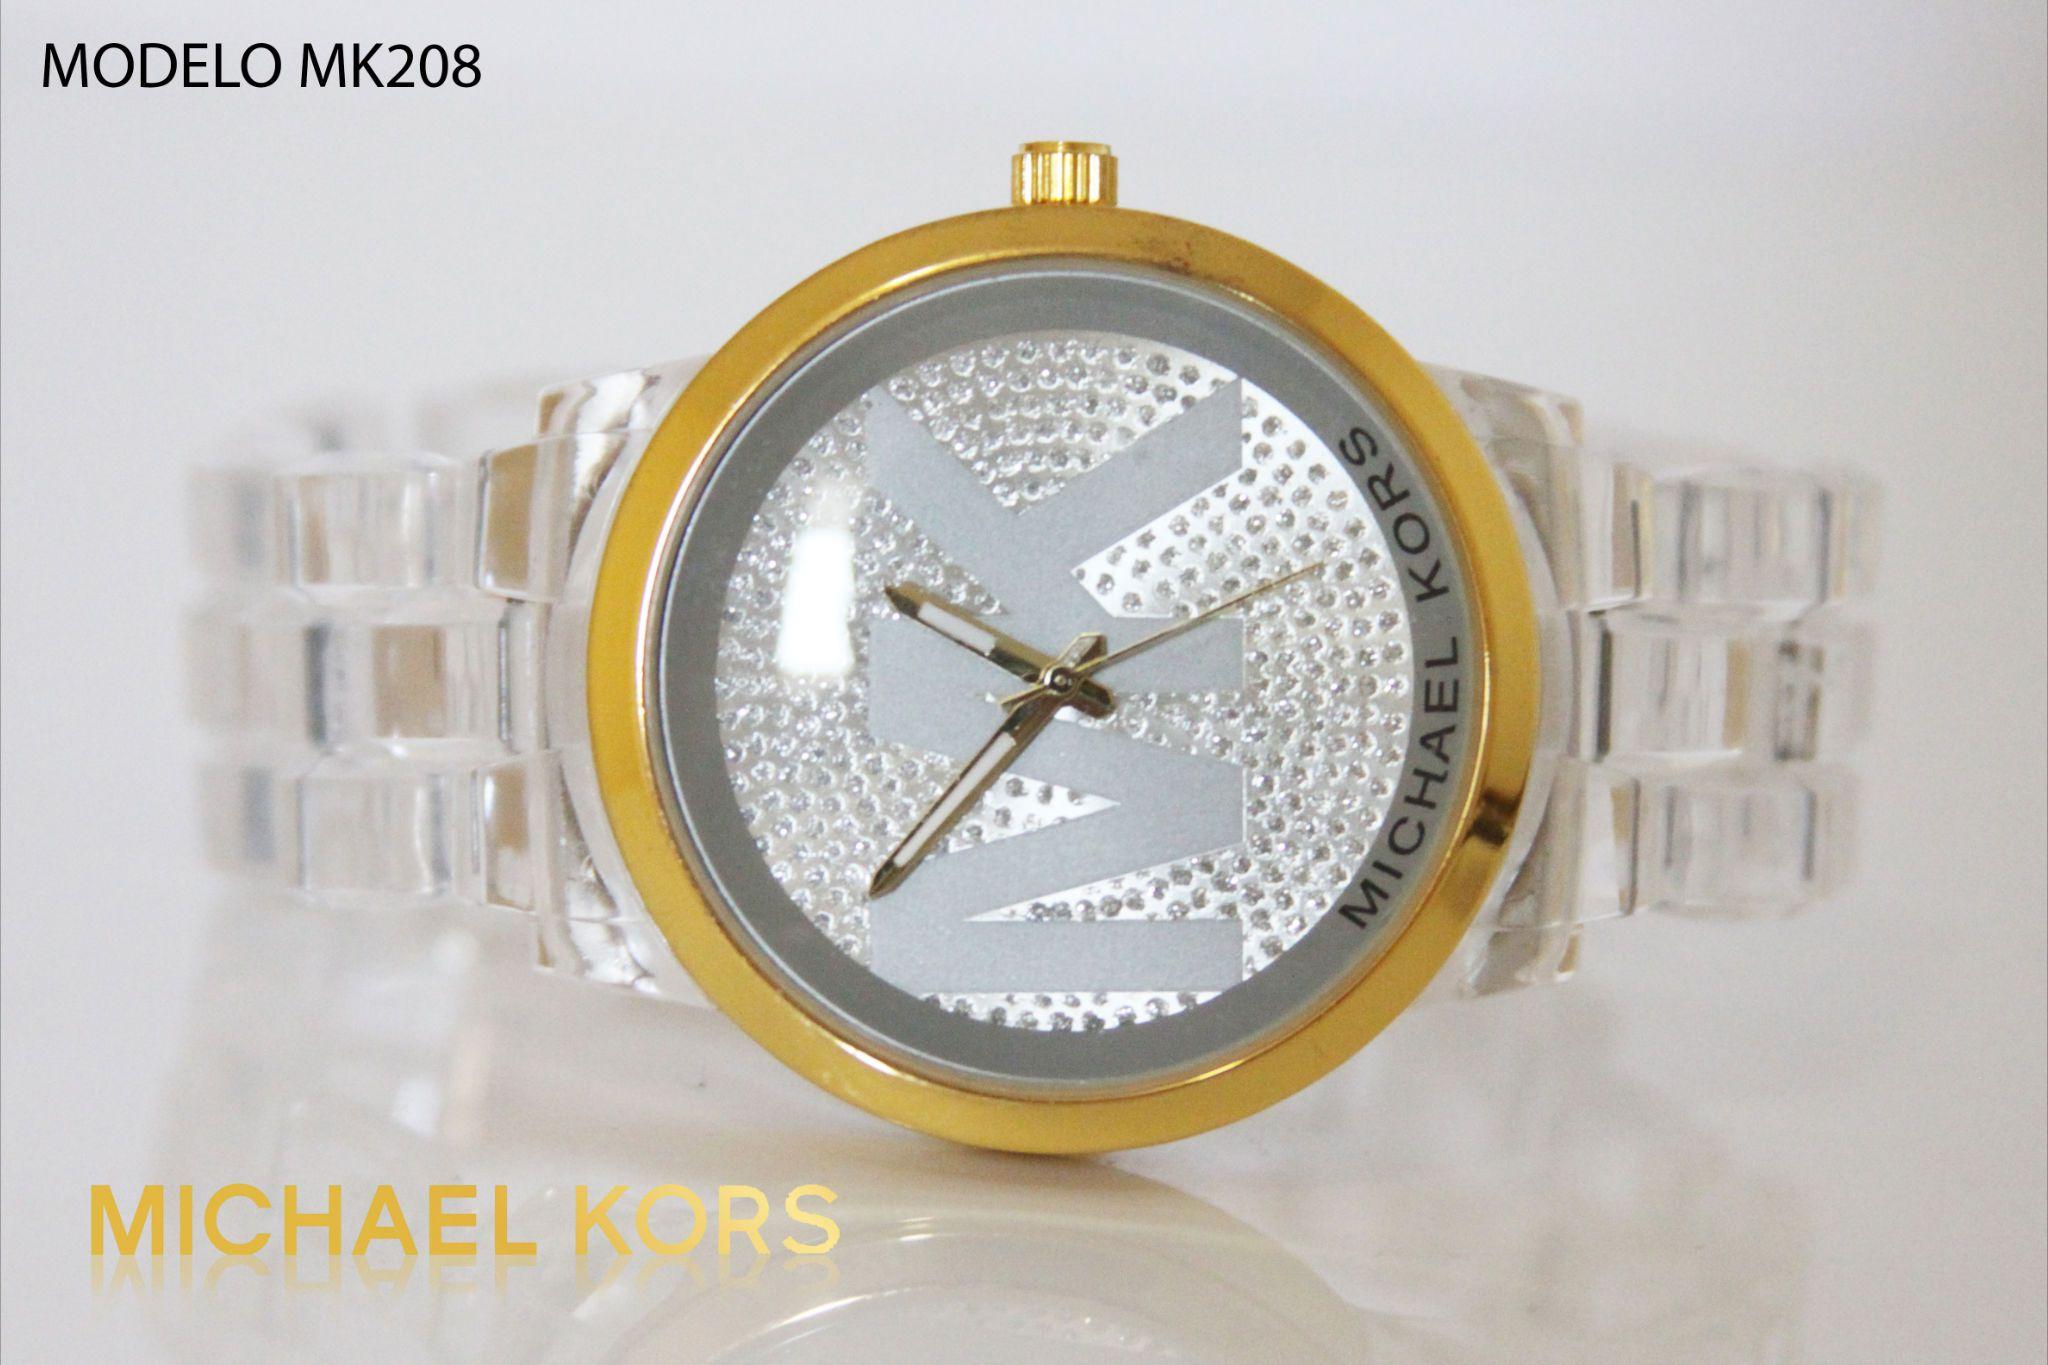 Reloj Michael kors dama transparente   Relojes Michael Kors Dama e4f0424040